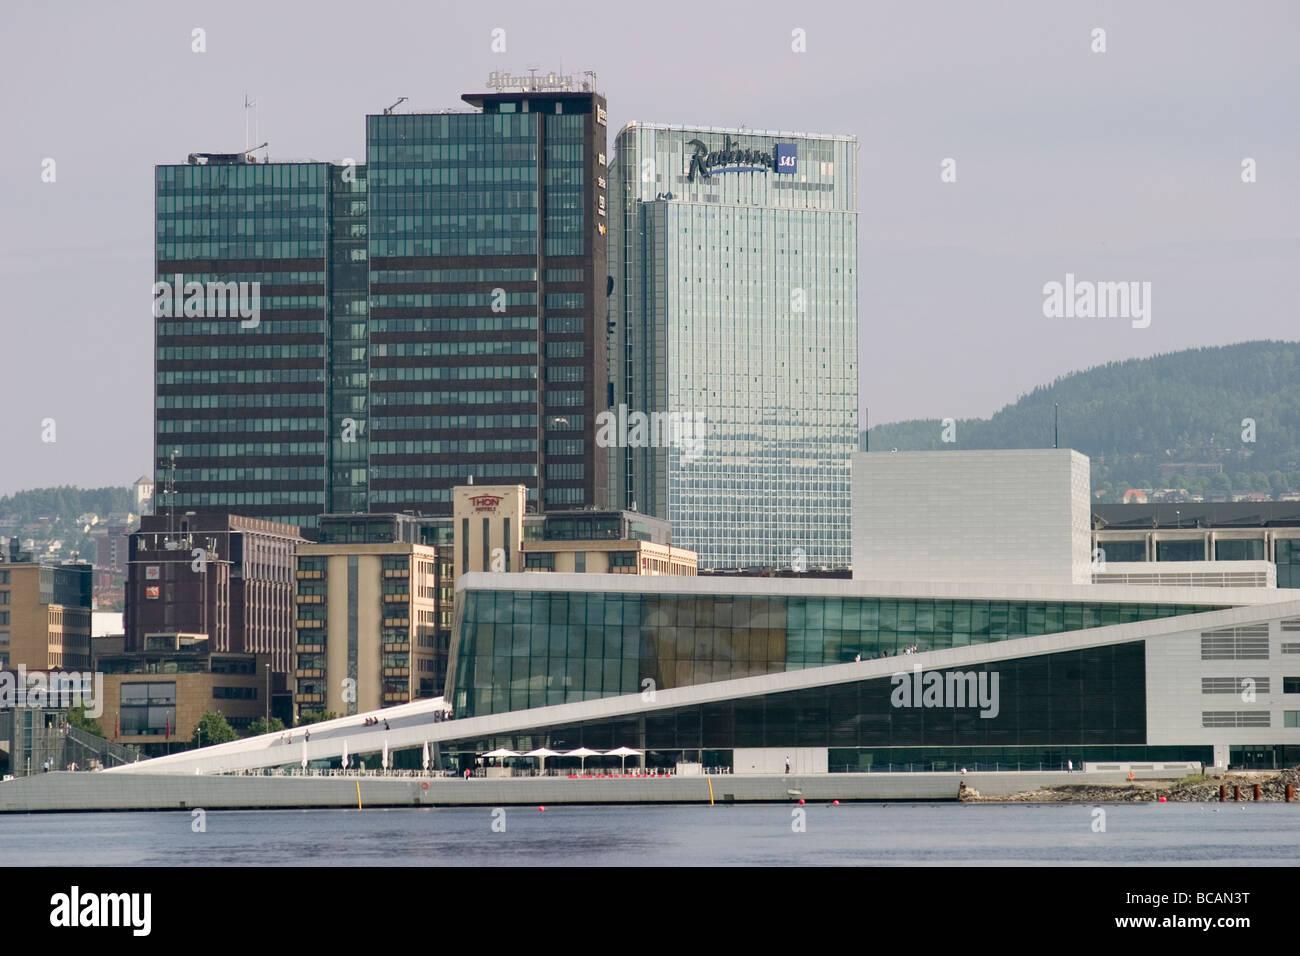 Norway Oslo Opera House, Bjørvika - Stock Image